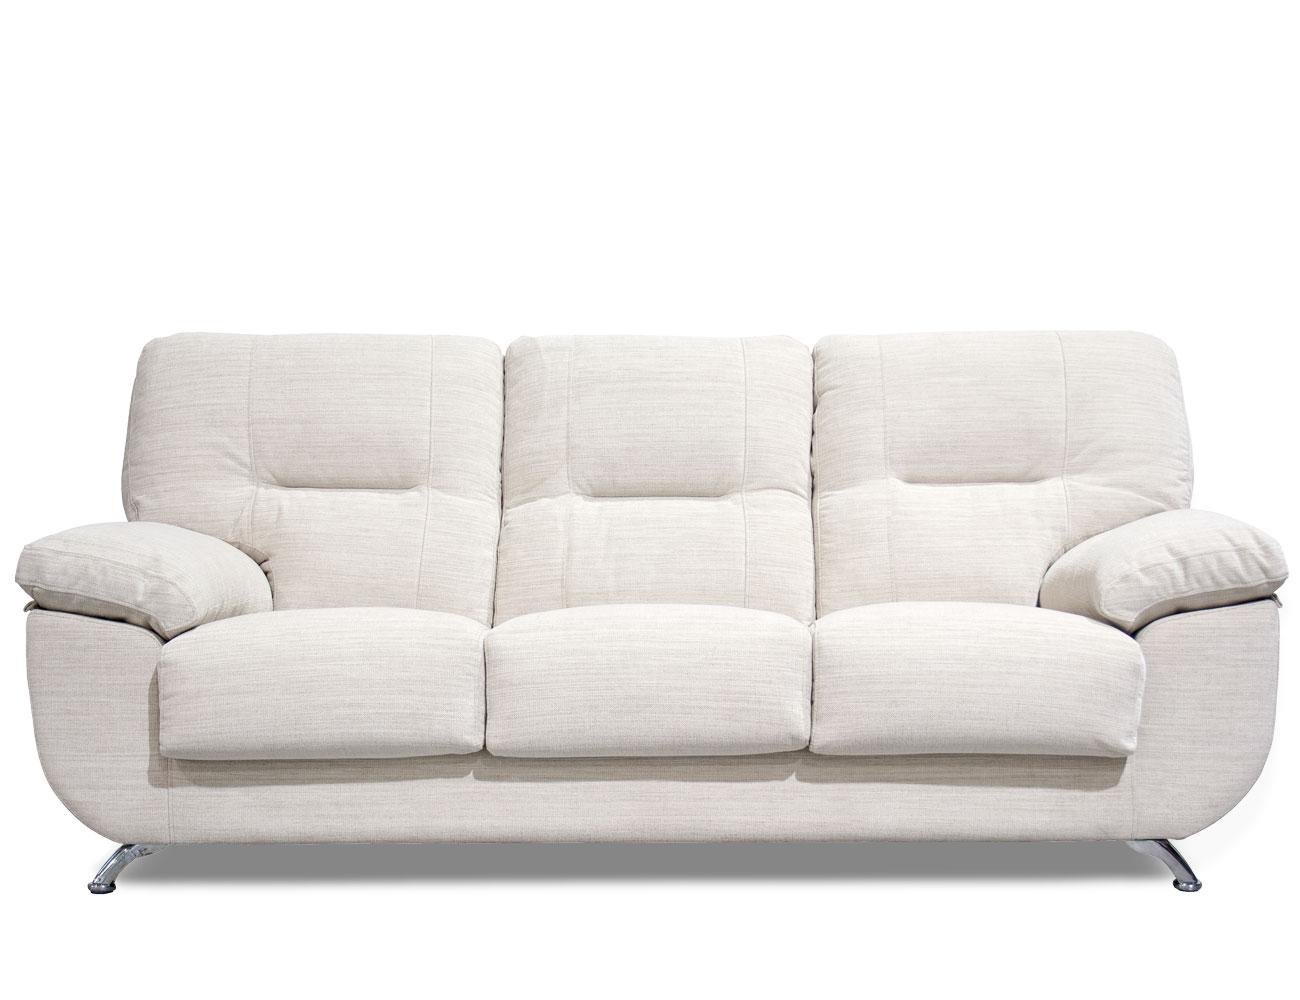 Sofa 3 asientos 214 cm 2